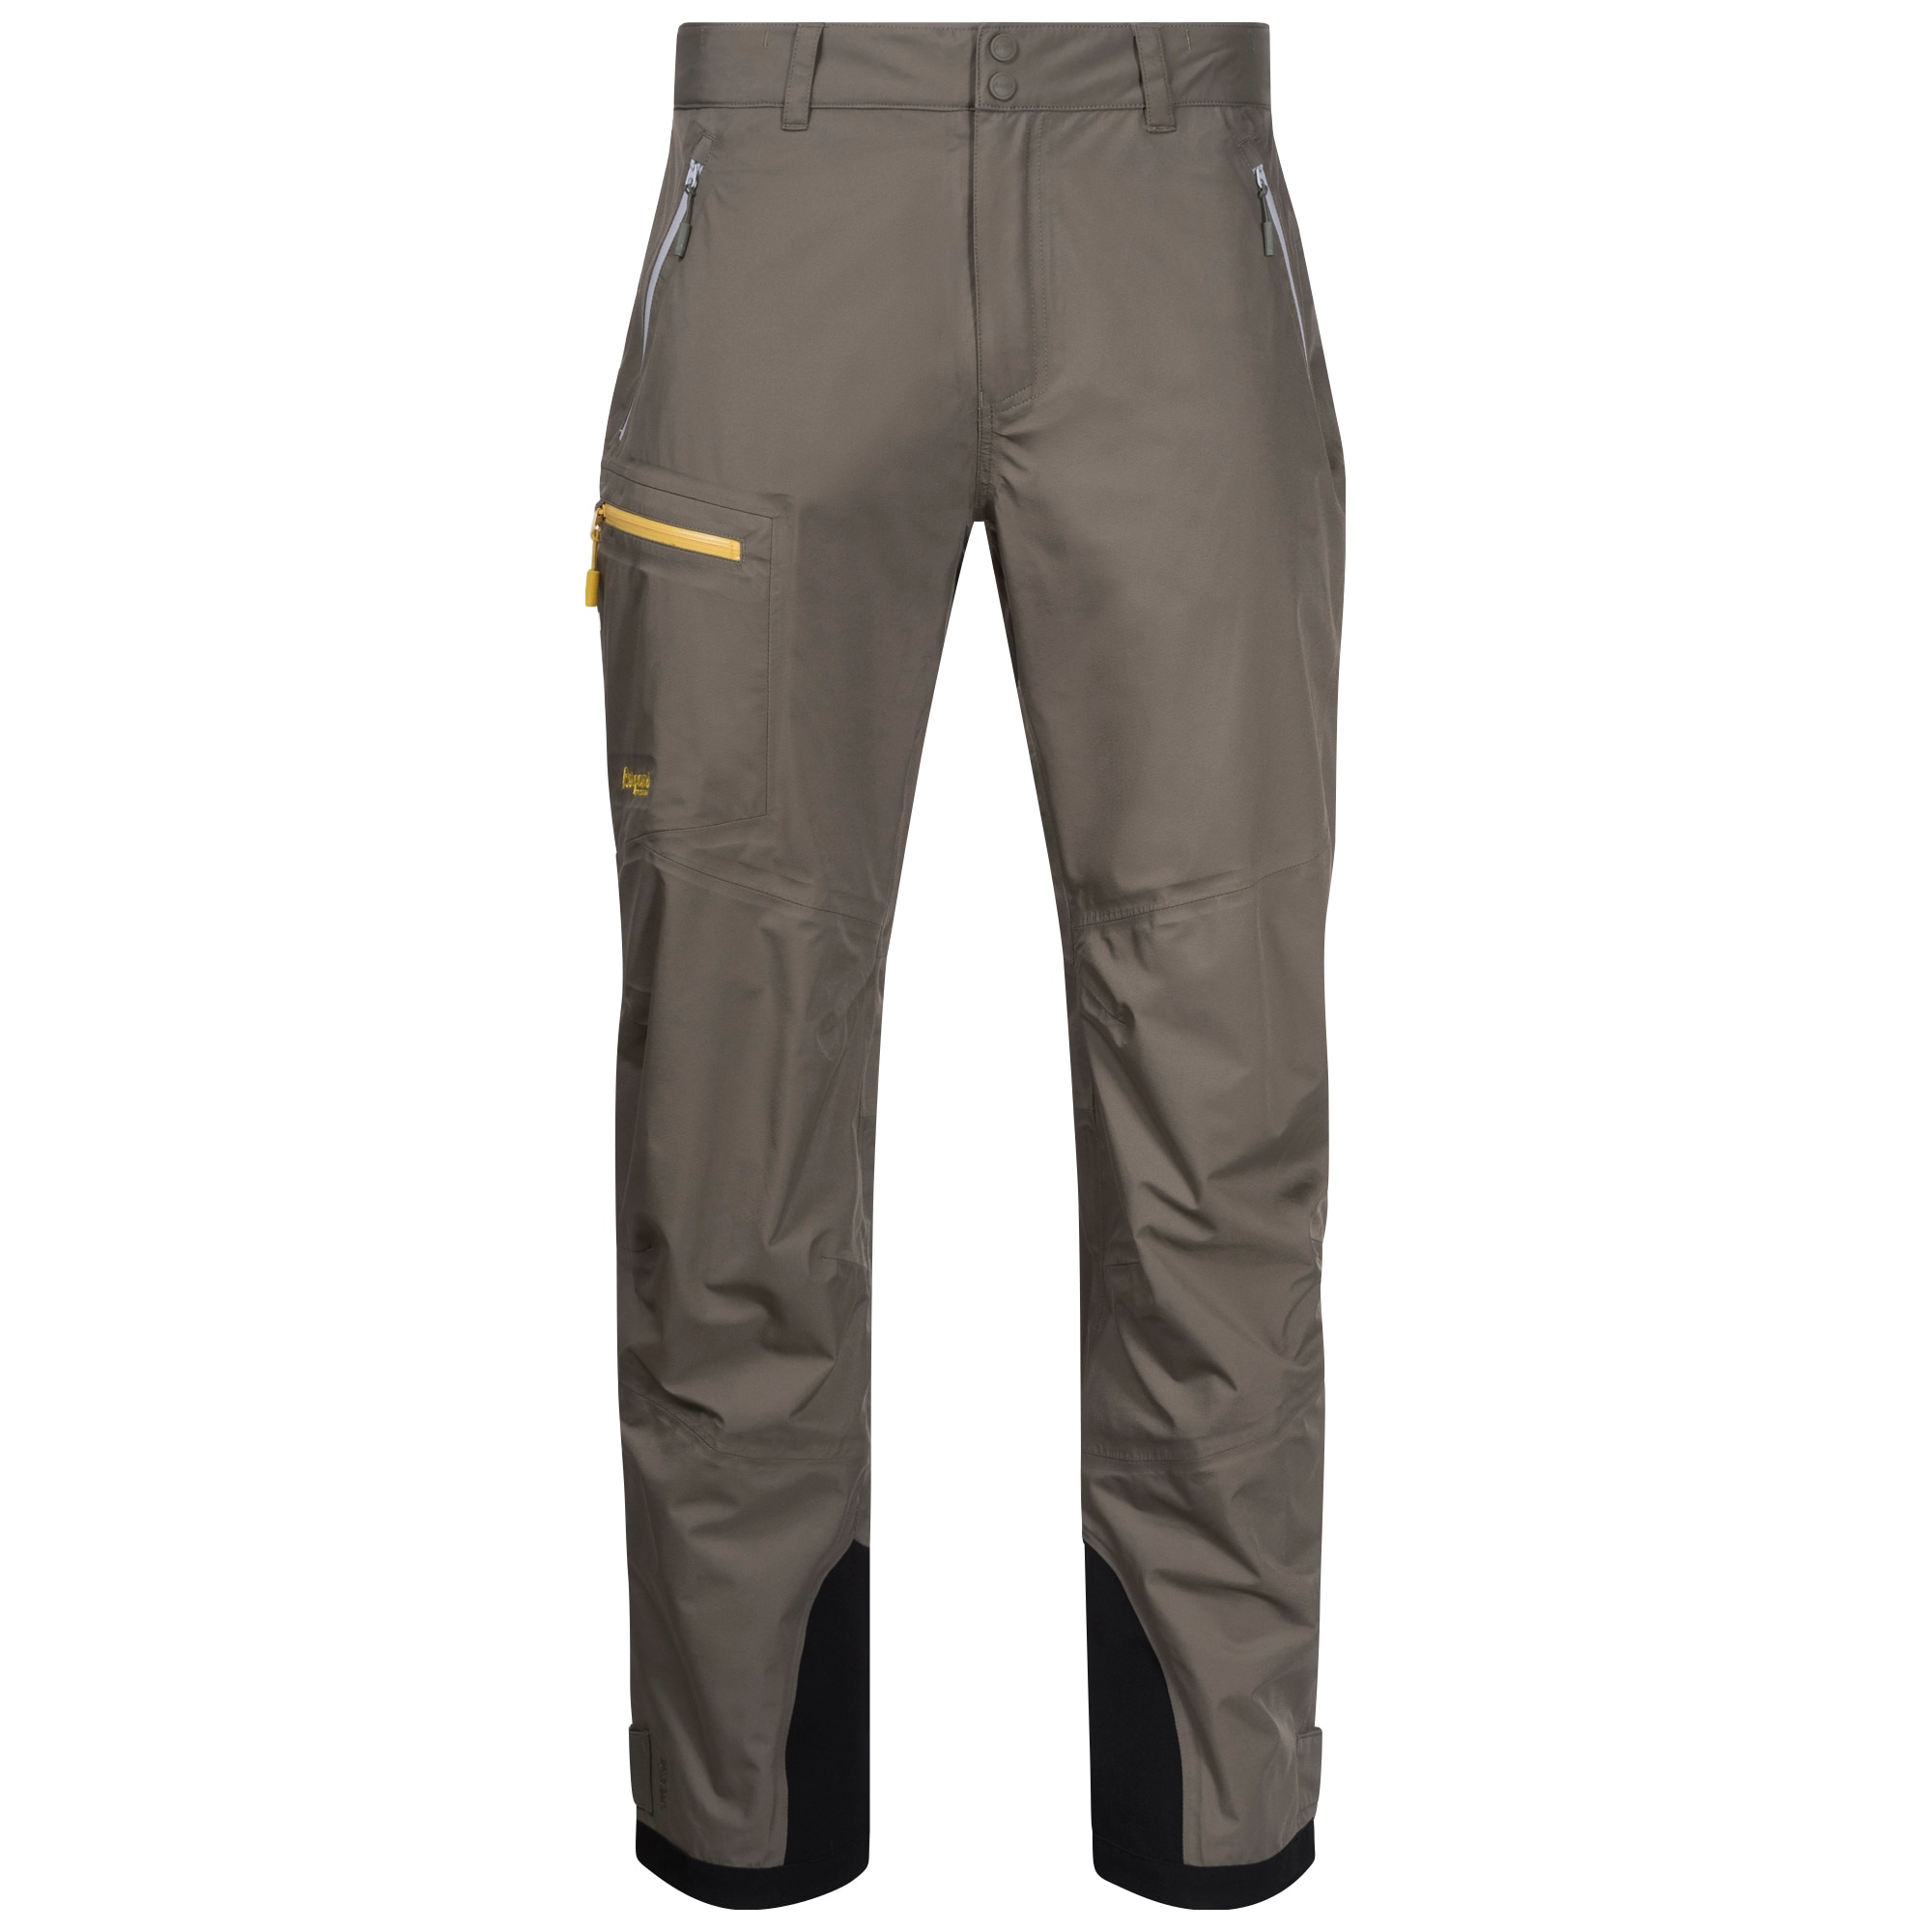 Romsdal 3L Pants